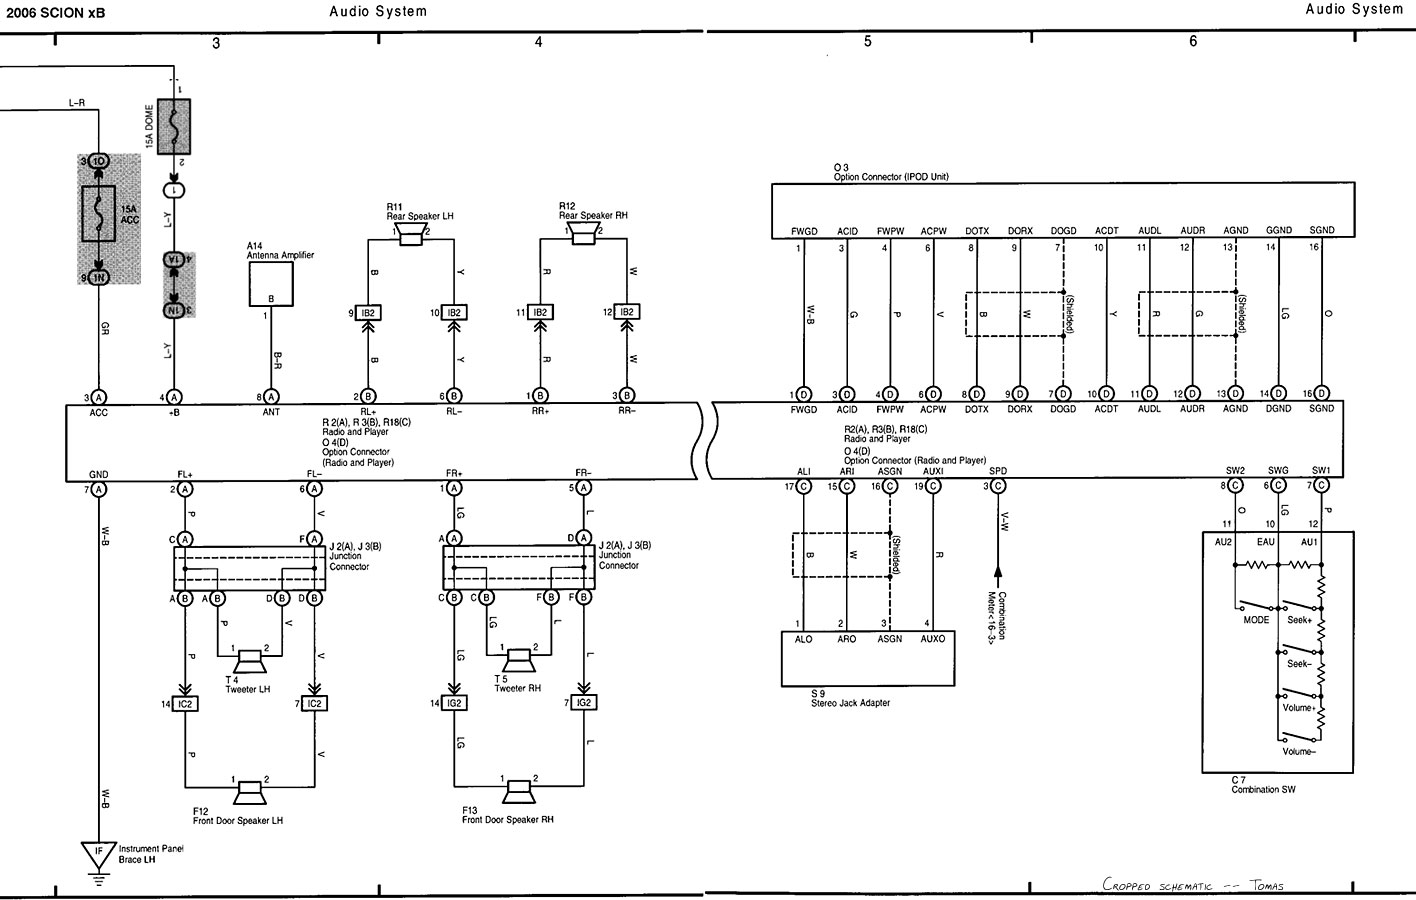 2005 Scion Tc Wiring Diagram Library. Stunning Scion Fuse Box Photos. Scion. 2015 Scion Xb Wiring At Scoala.co